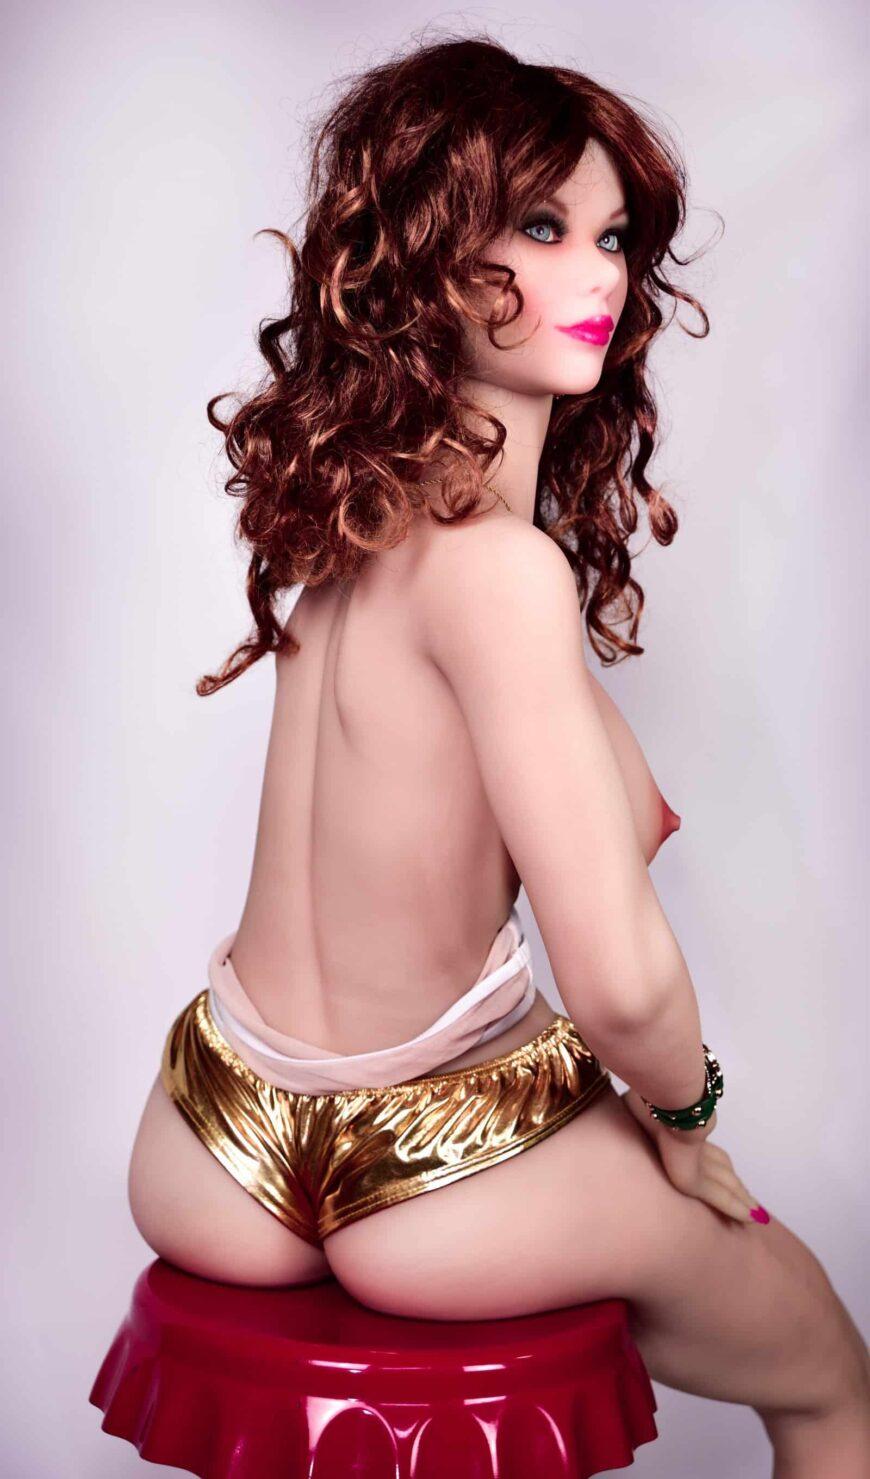 Sex-Dolls-Aidra-from-Dirty-Knights-Sex-Dolls-Posing-Sexy-1 (11)